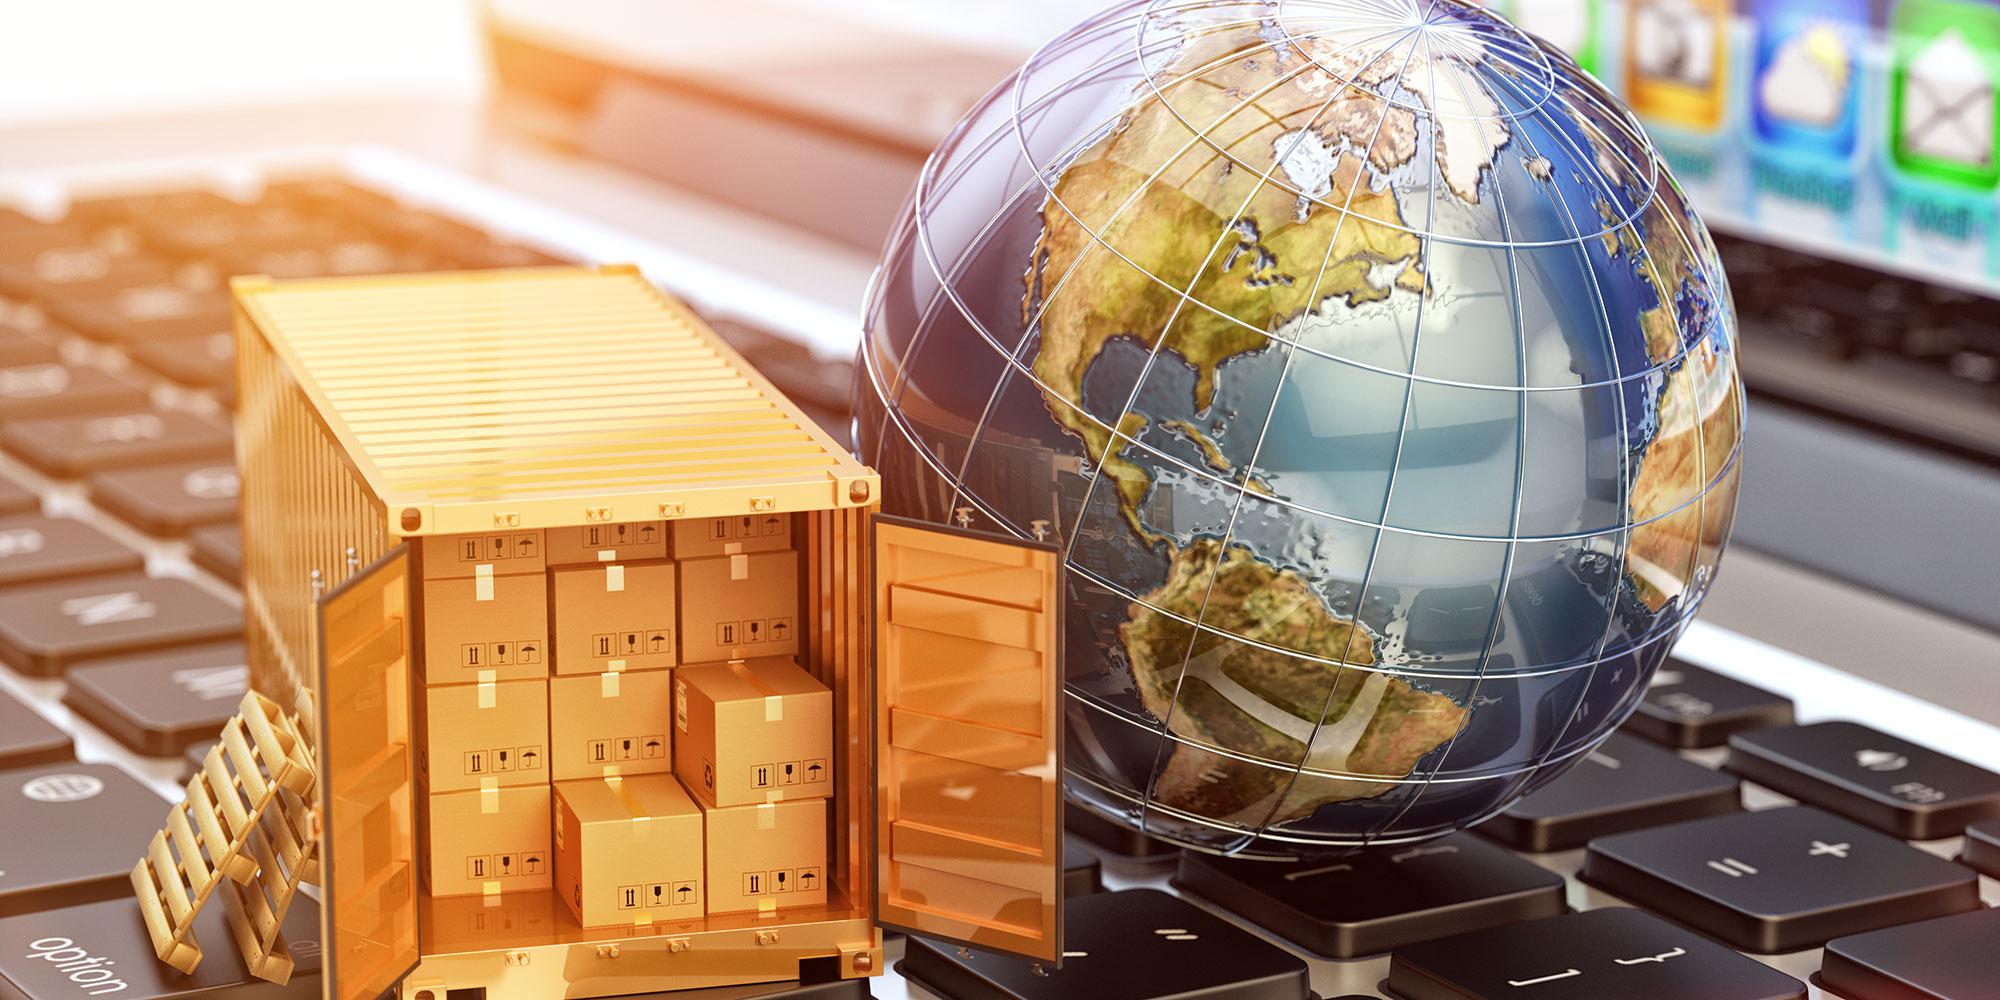 SPEEDA | Retail Cross-Border E-Commerce in China: Will New